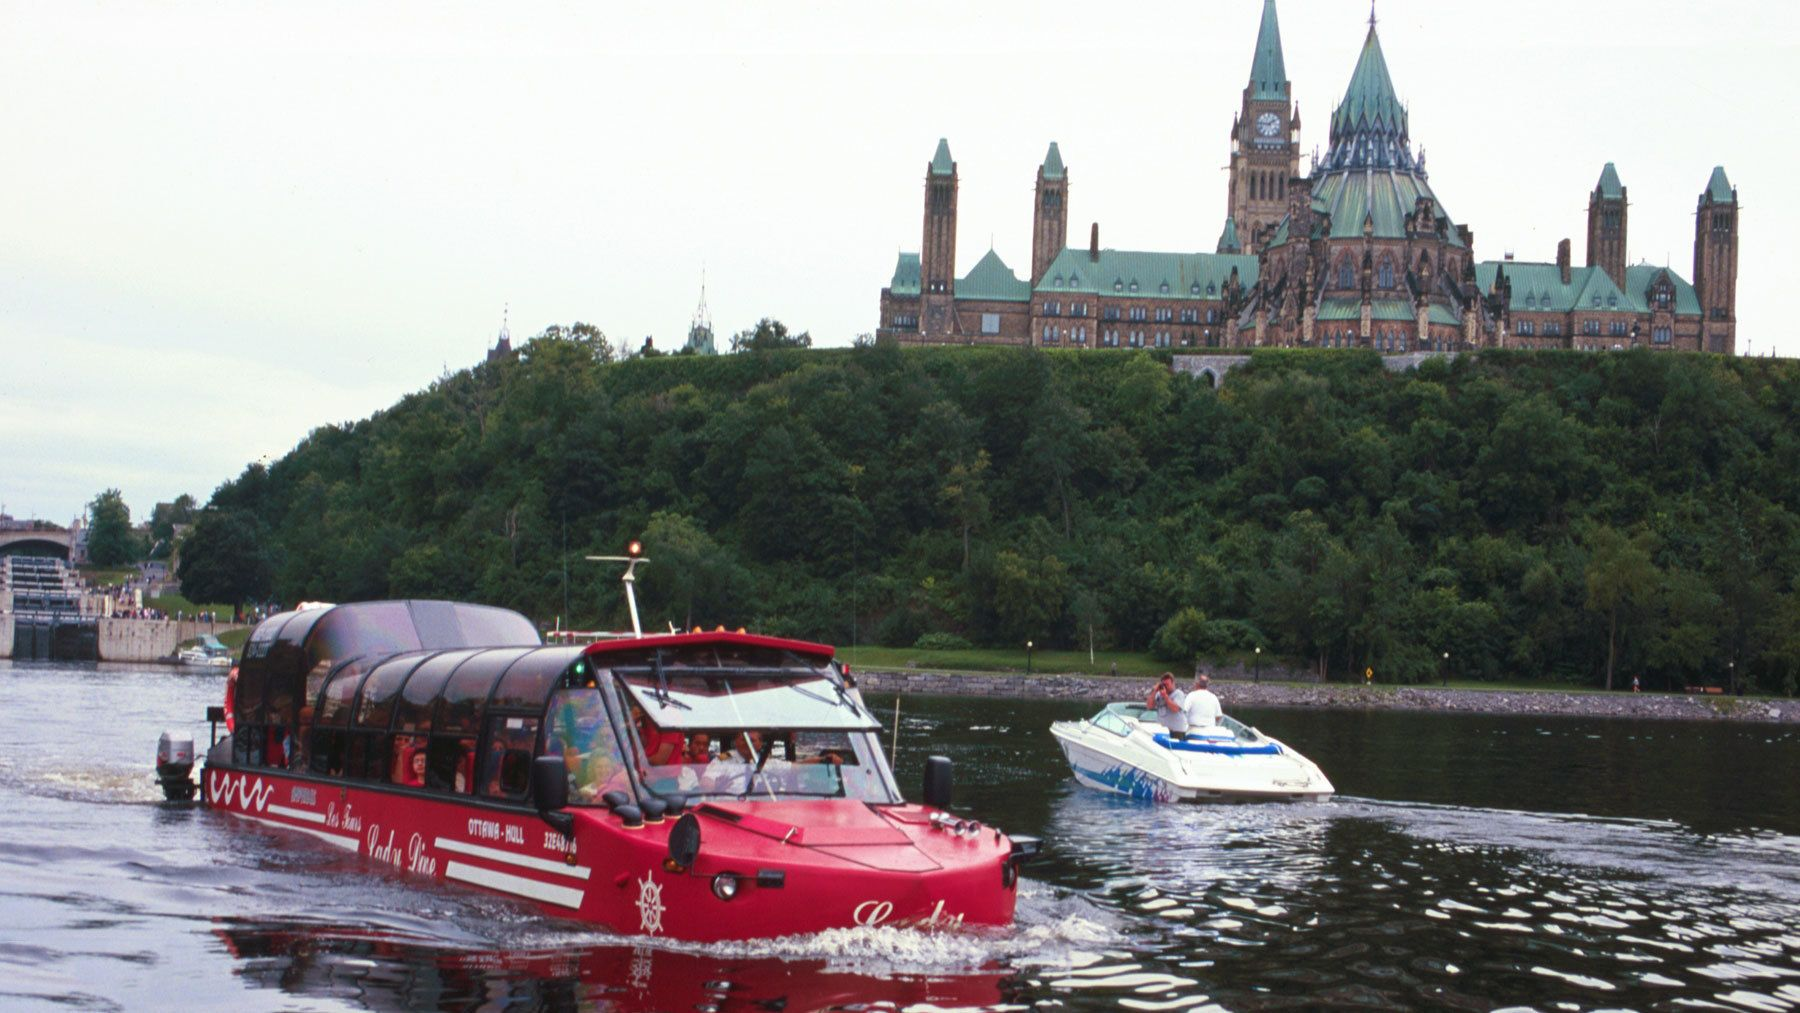 Amphibious Vehicle Water & Land City Tour